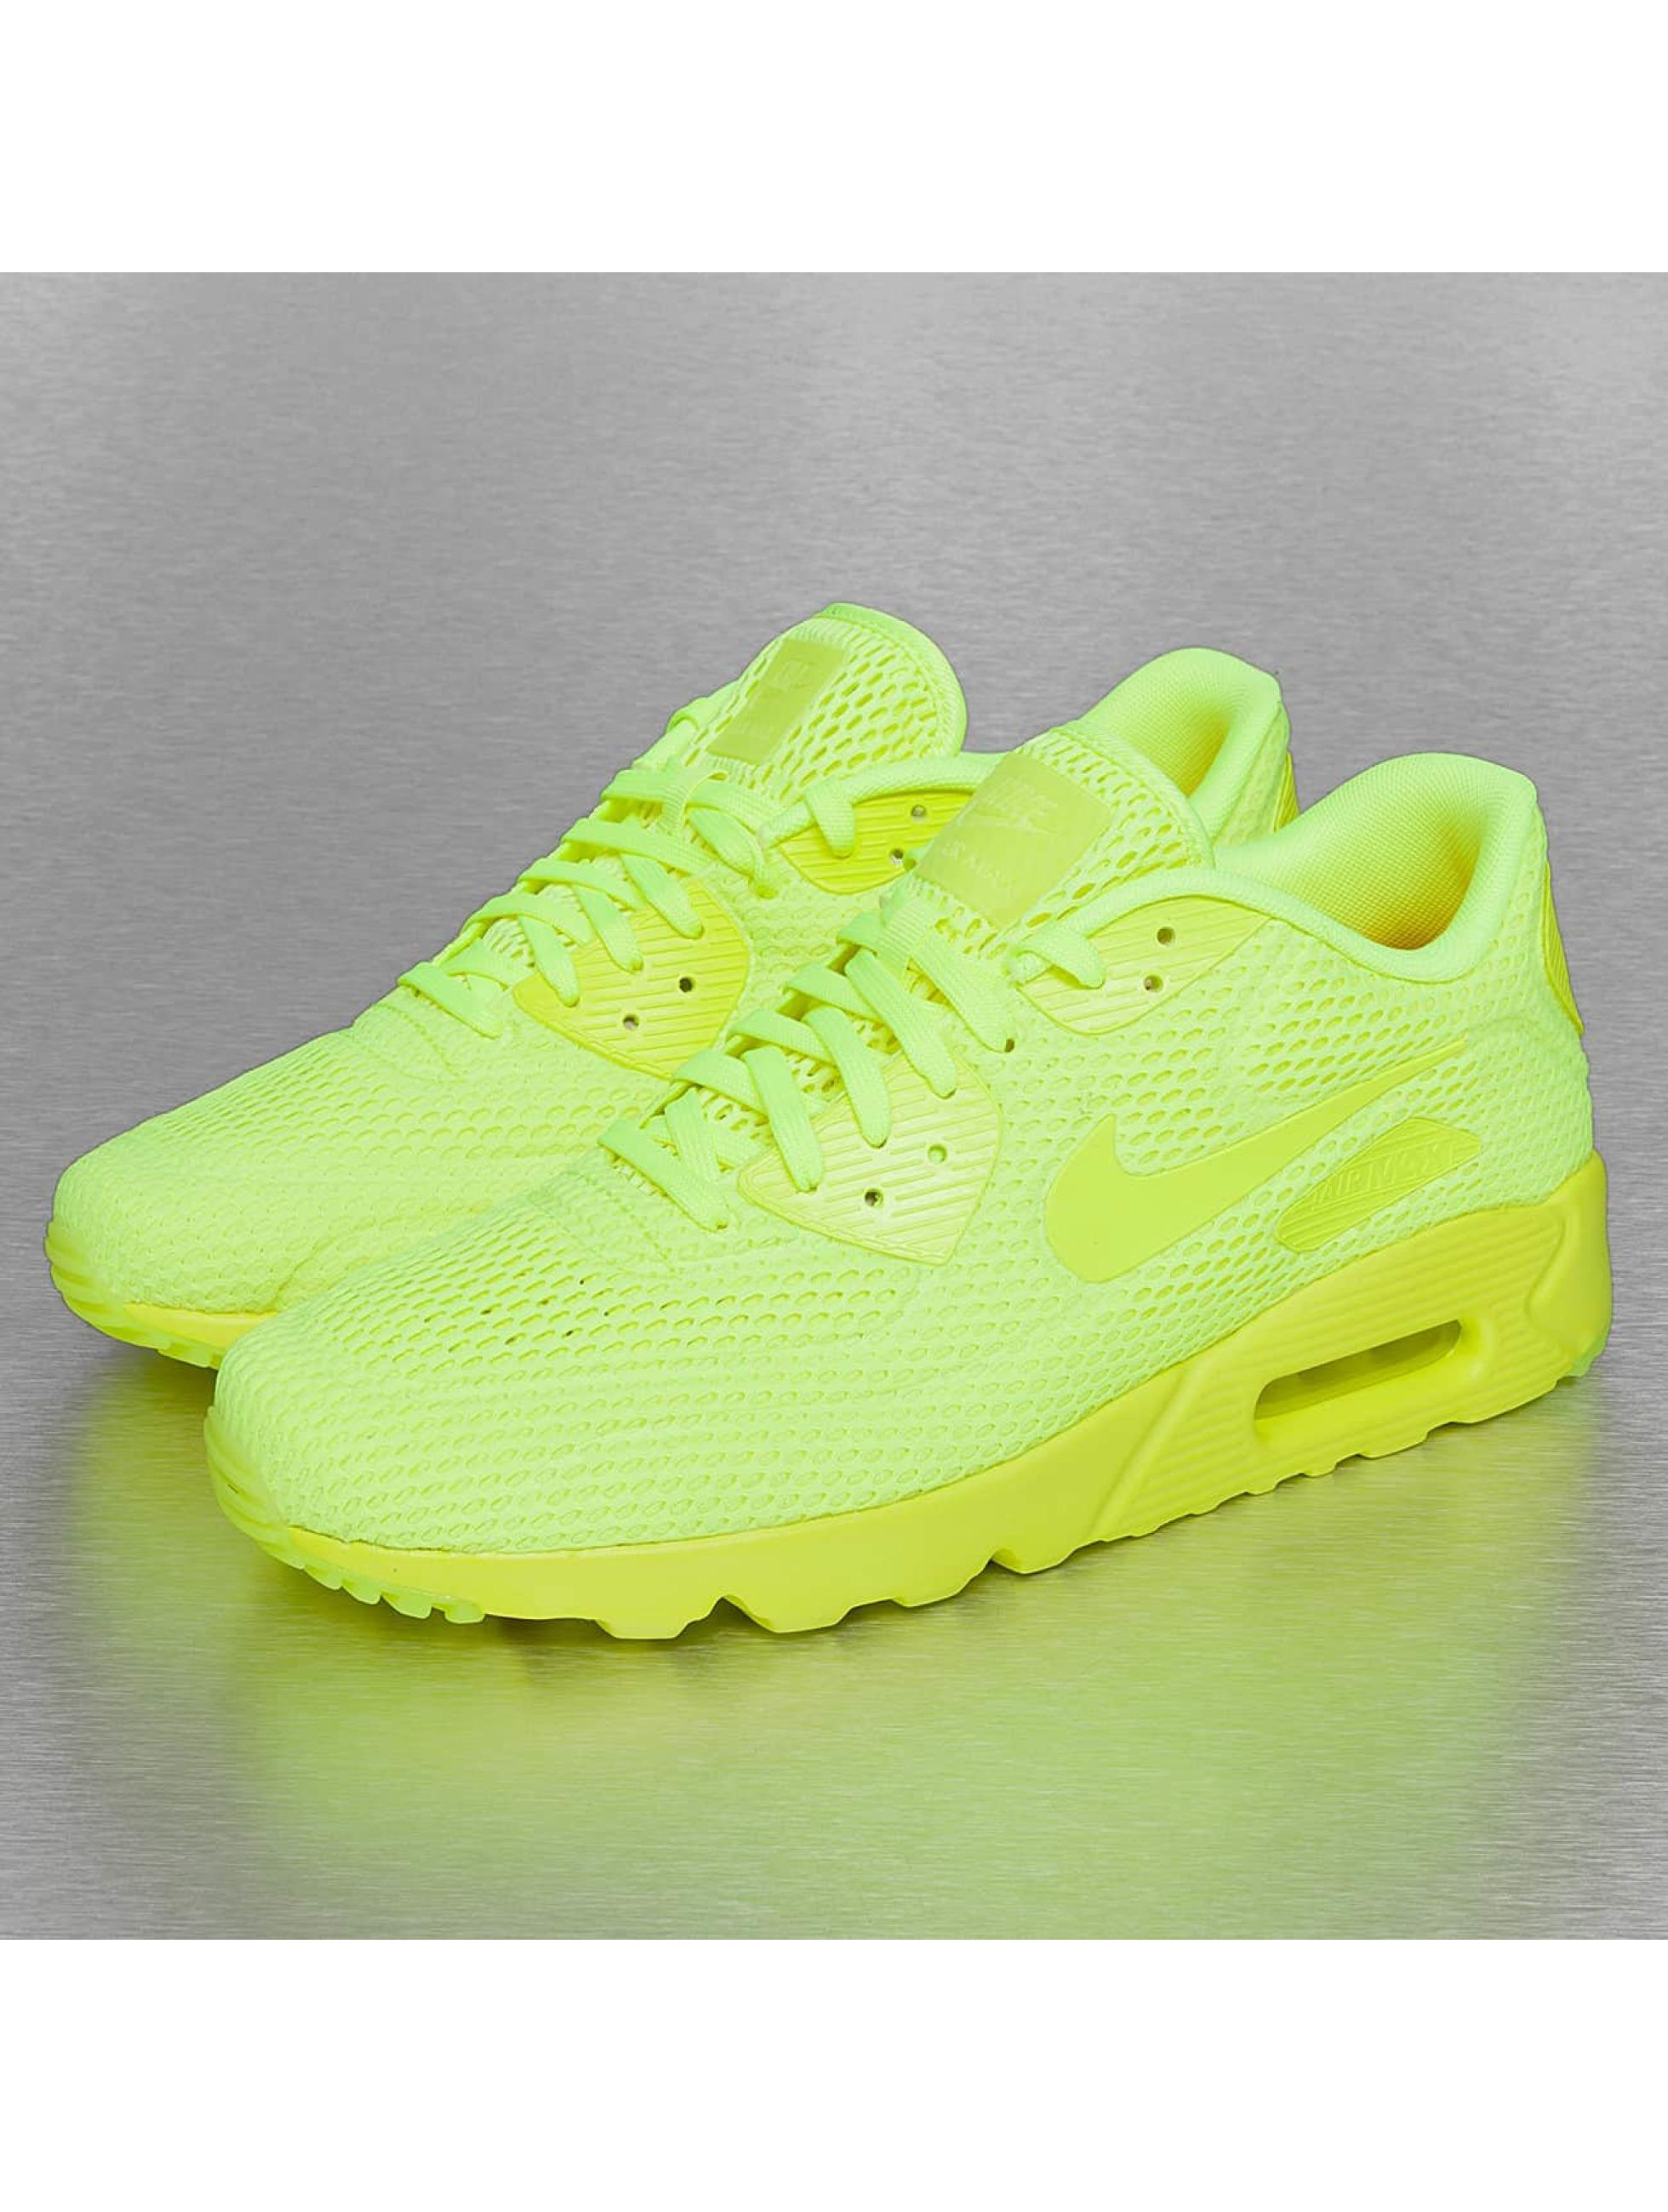 Nike Chaussures / Baskets Air Max 90 Ultra BR en jaune